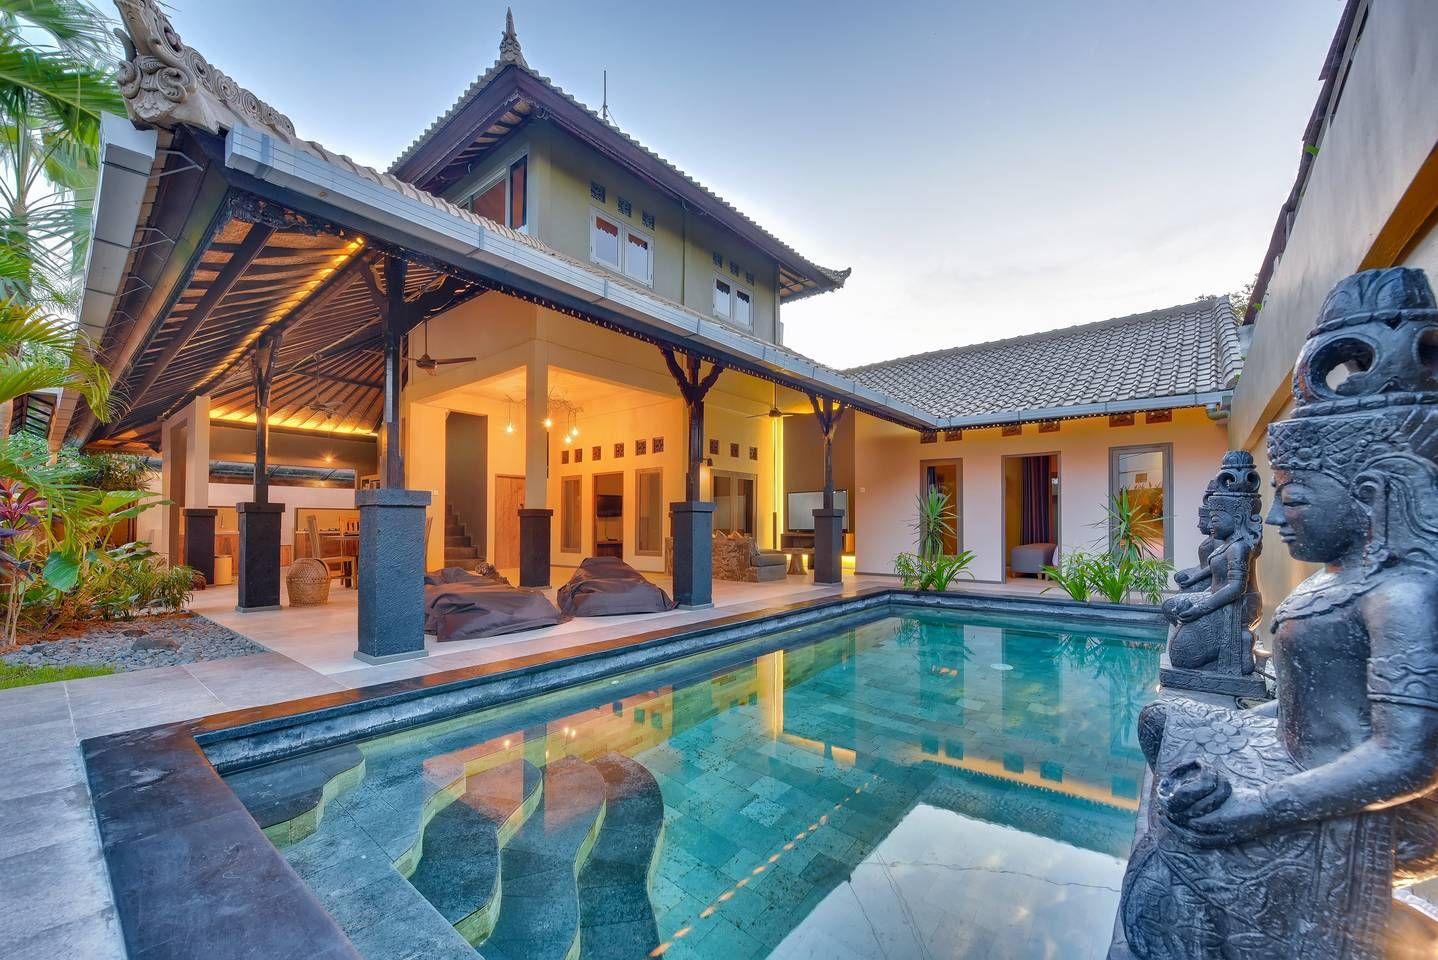 188 Per 6 Ppl 7 Dats 6 Nights Villa Samera Seminyak Oberoi Villas For Rent In Kuta Bali Indonesia Villa Property House Styles